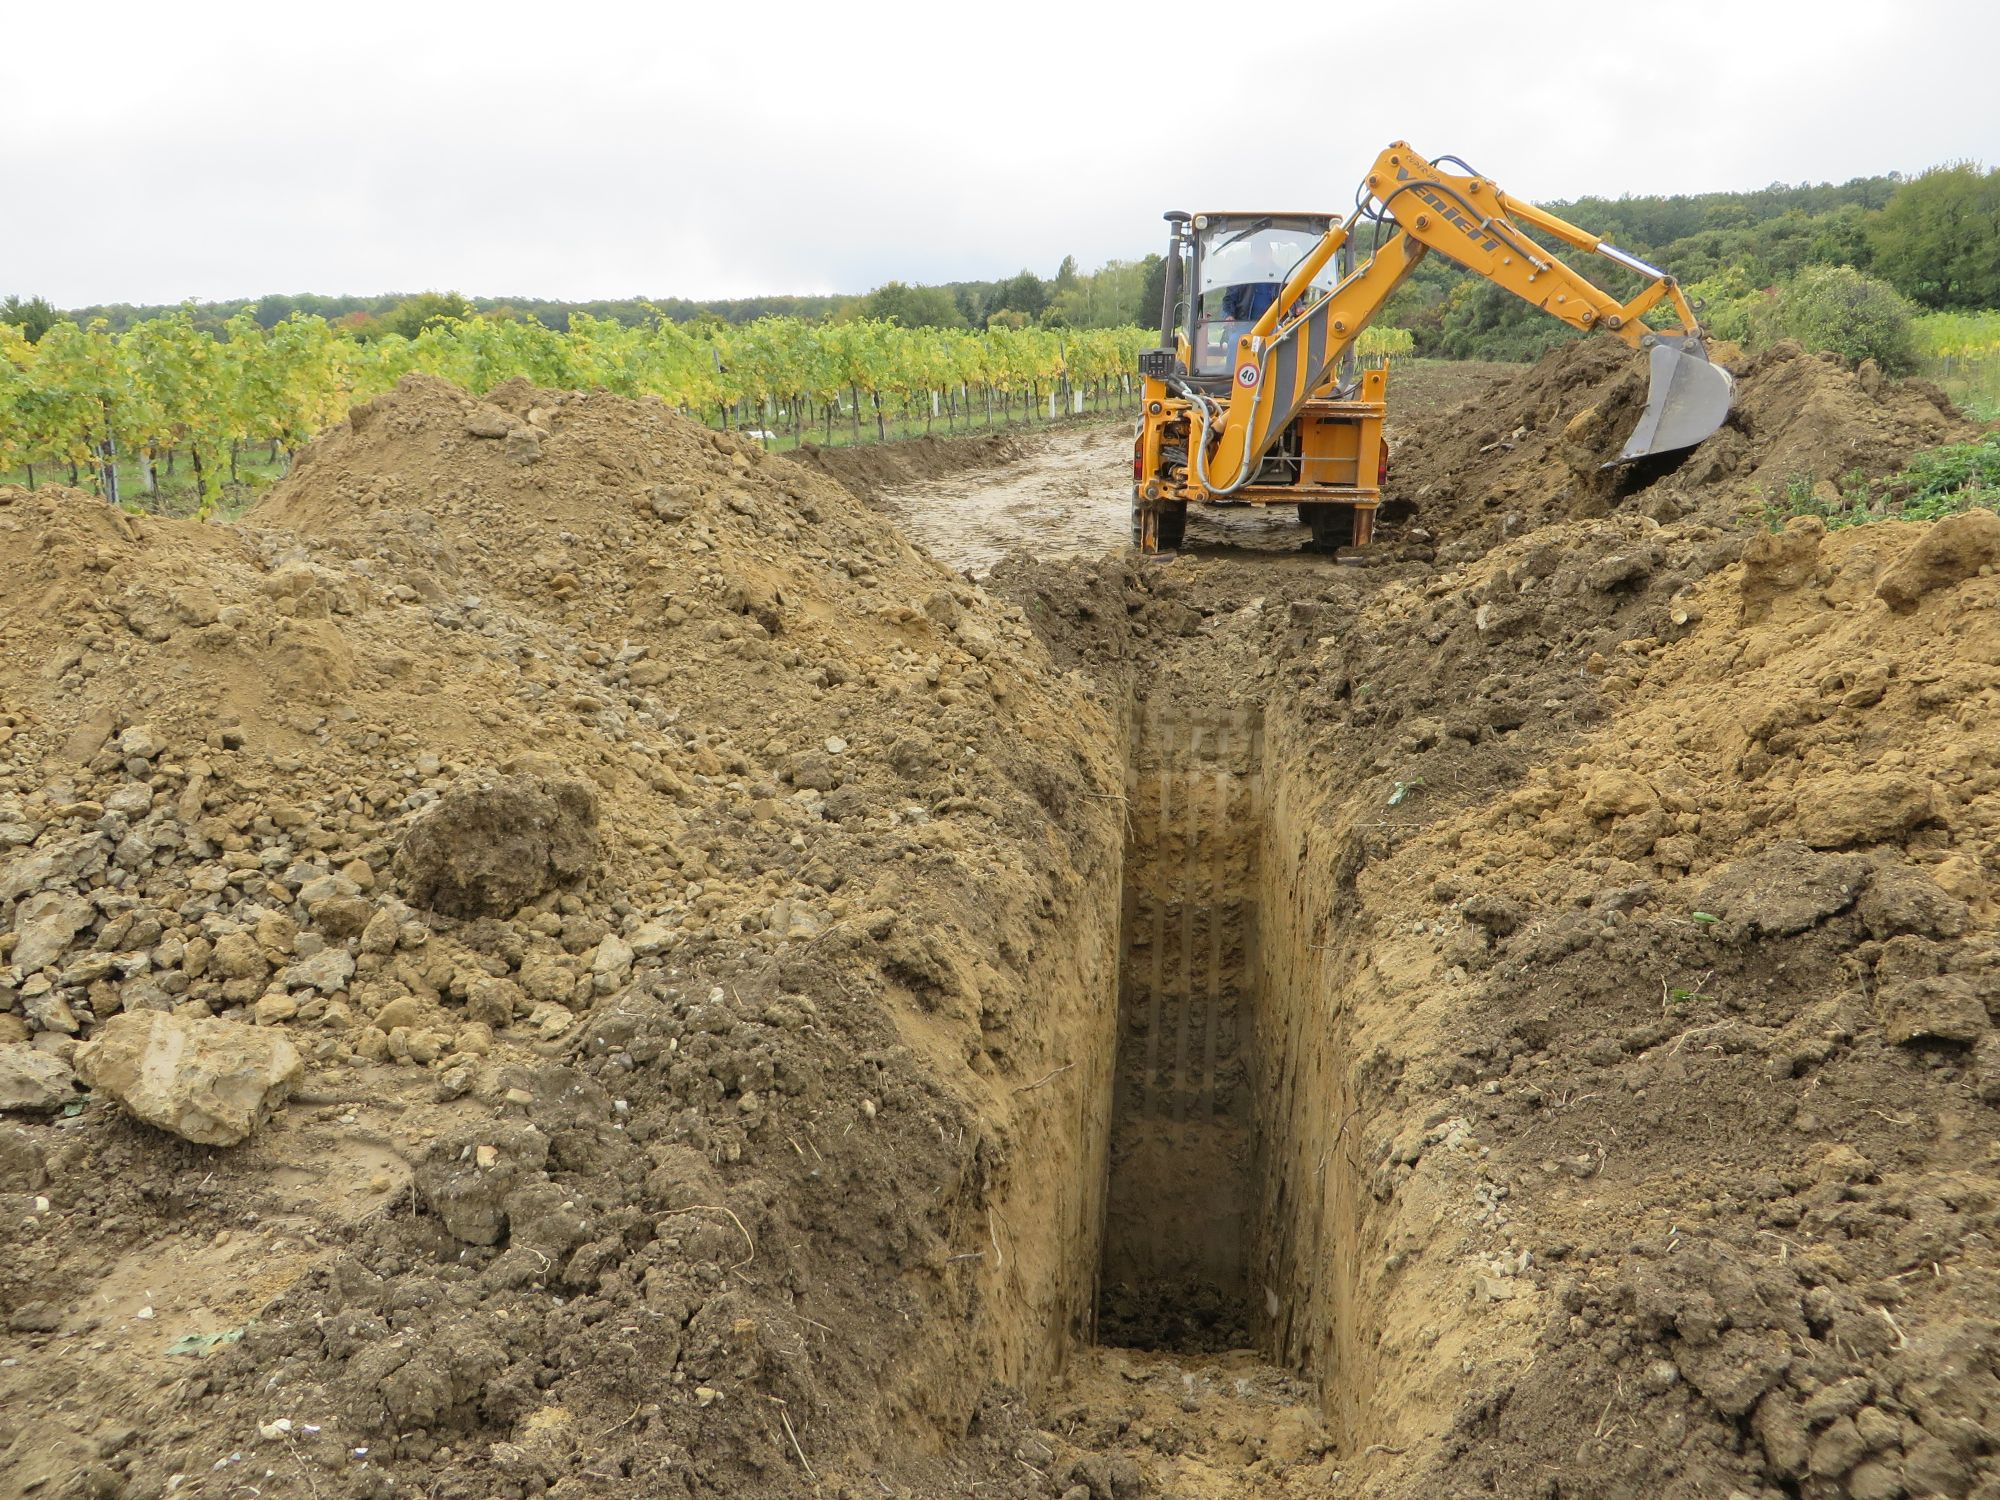 Grabung Gainfarn 2019, Grabung Gainfarn, Profilkünette (c) Gerhard Wanzenböck